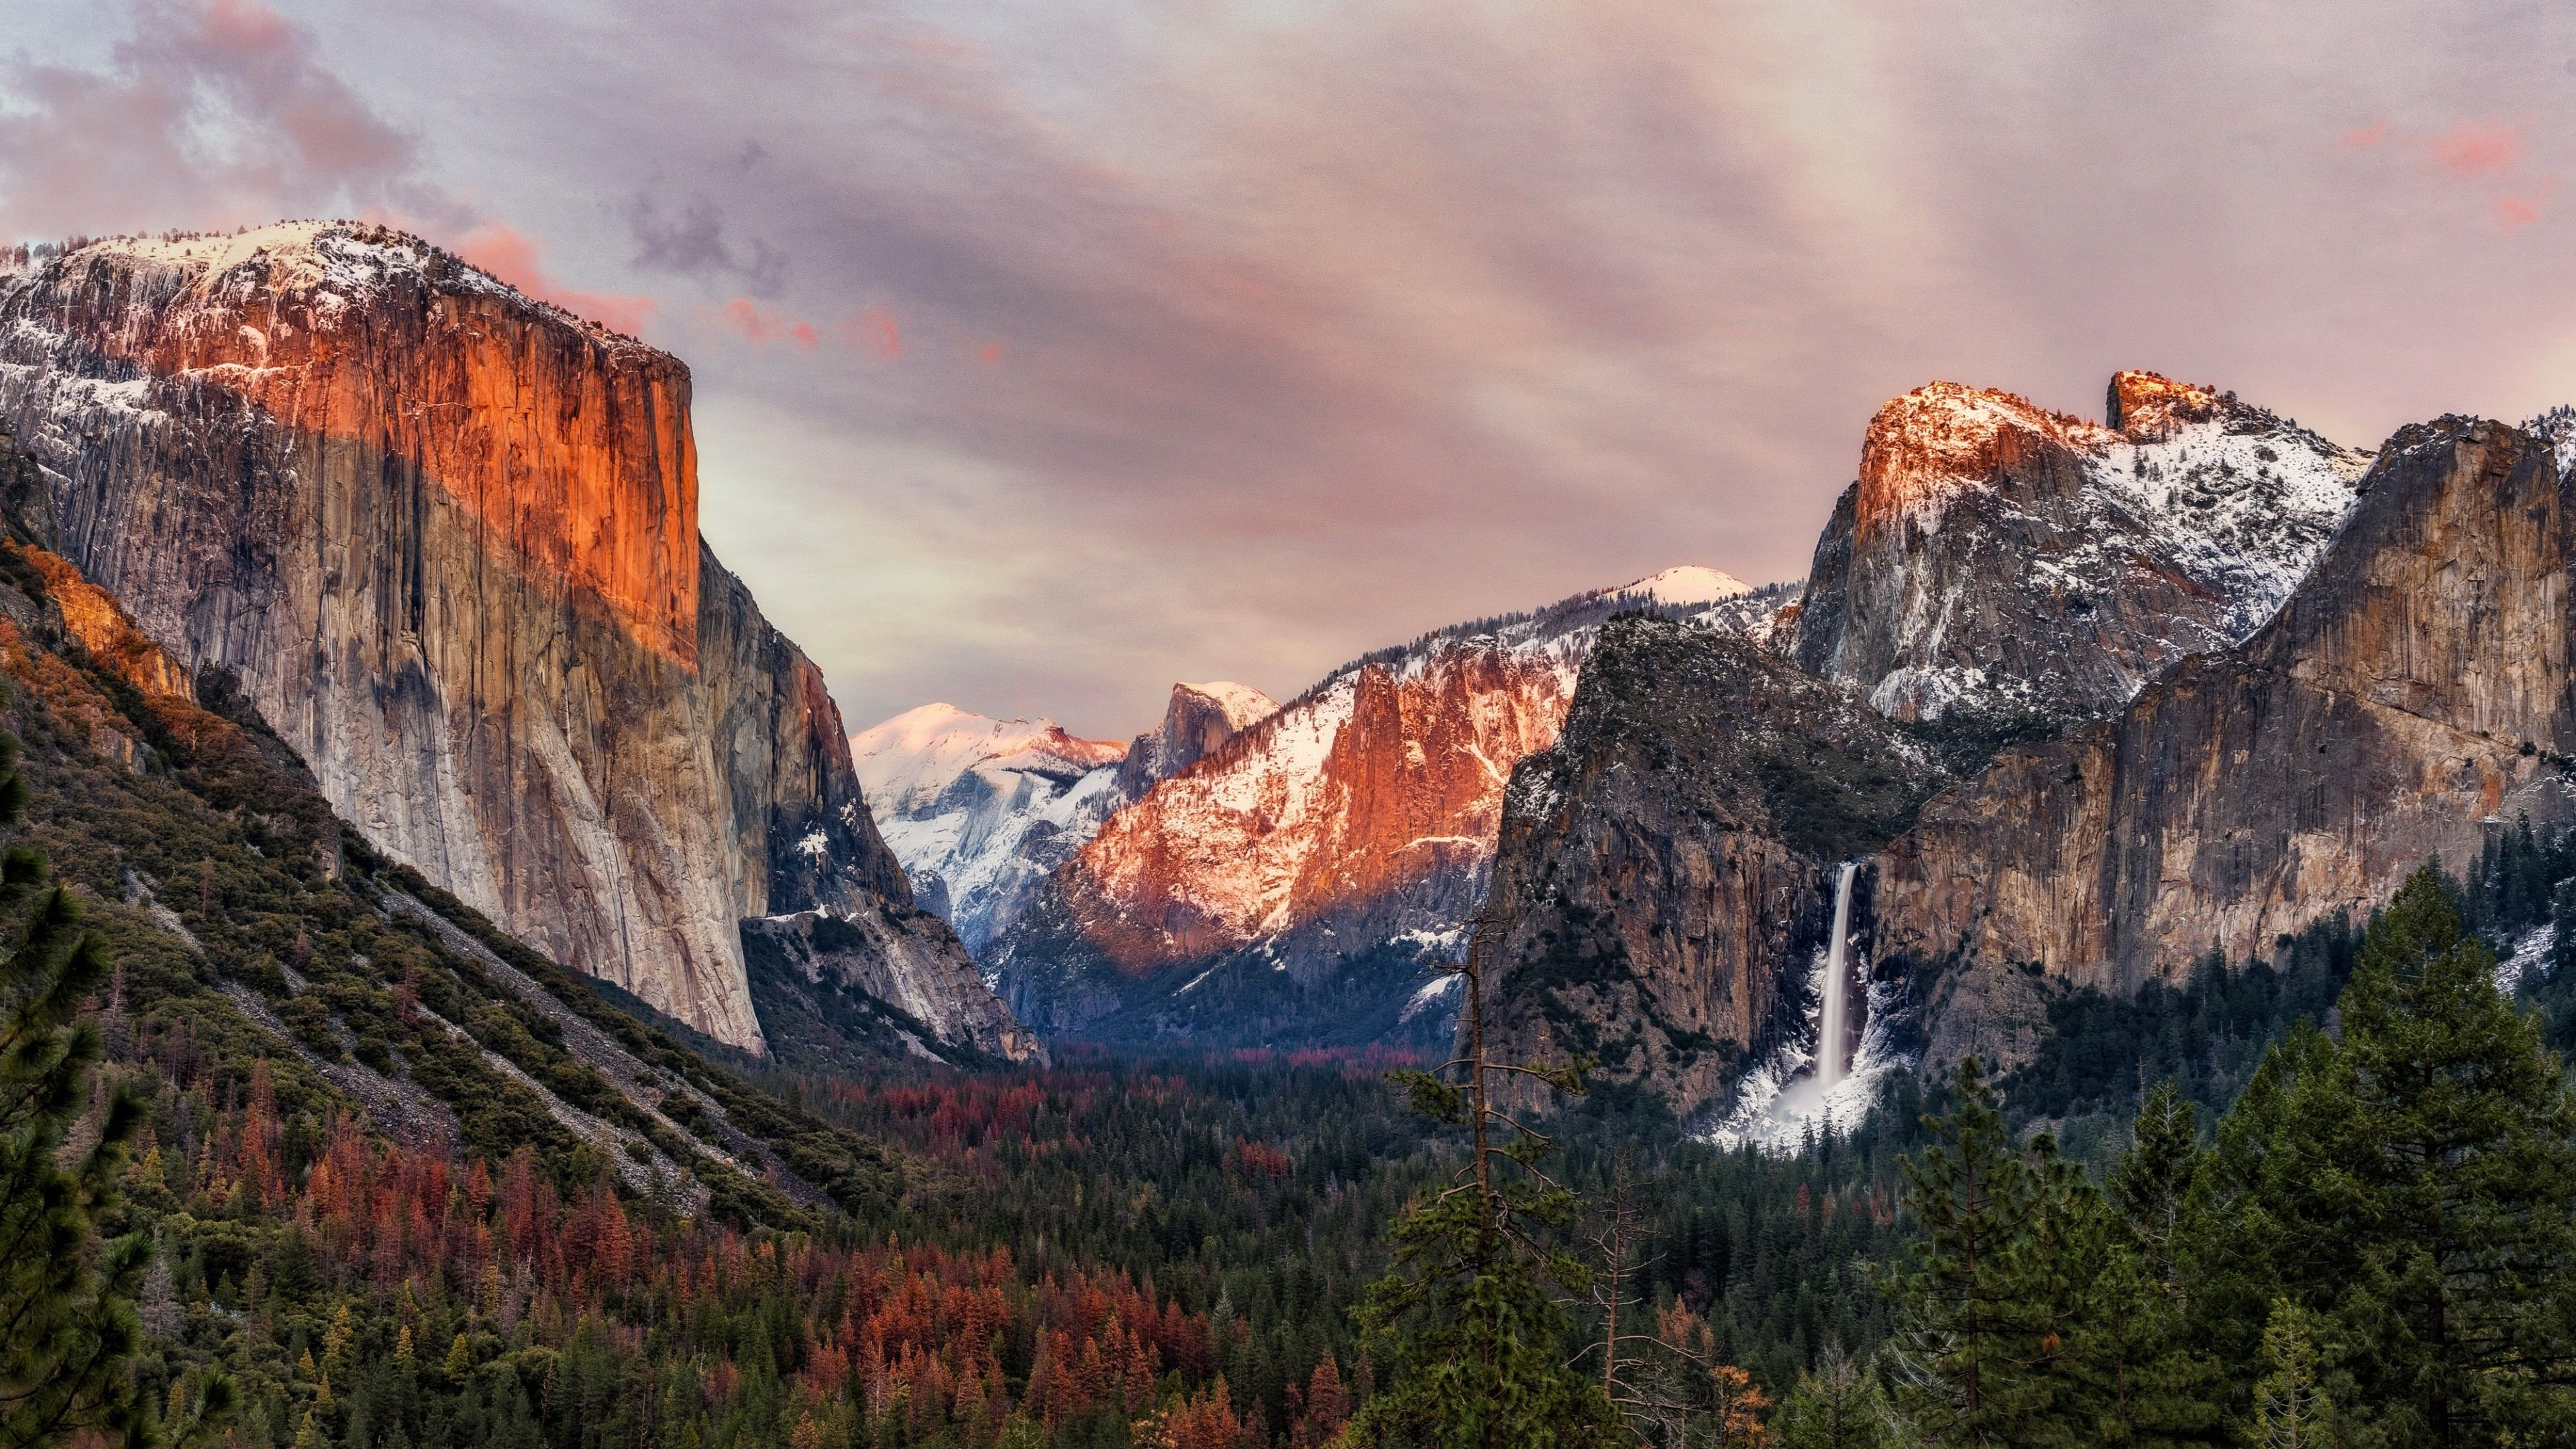 Yosemite National Park Landscape Wallpapers Top Free Yosemite National Park Landscape Backgrounds Wallpaperaccess